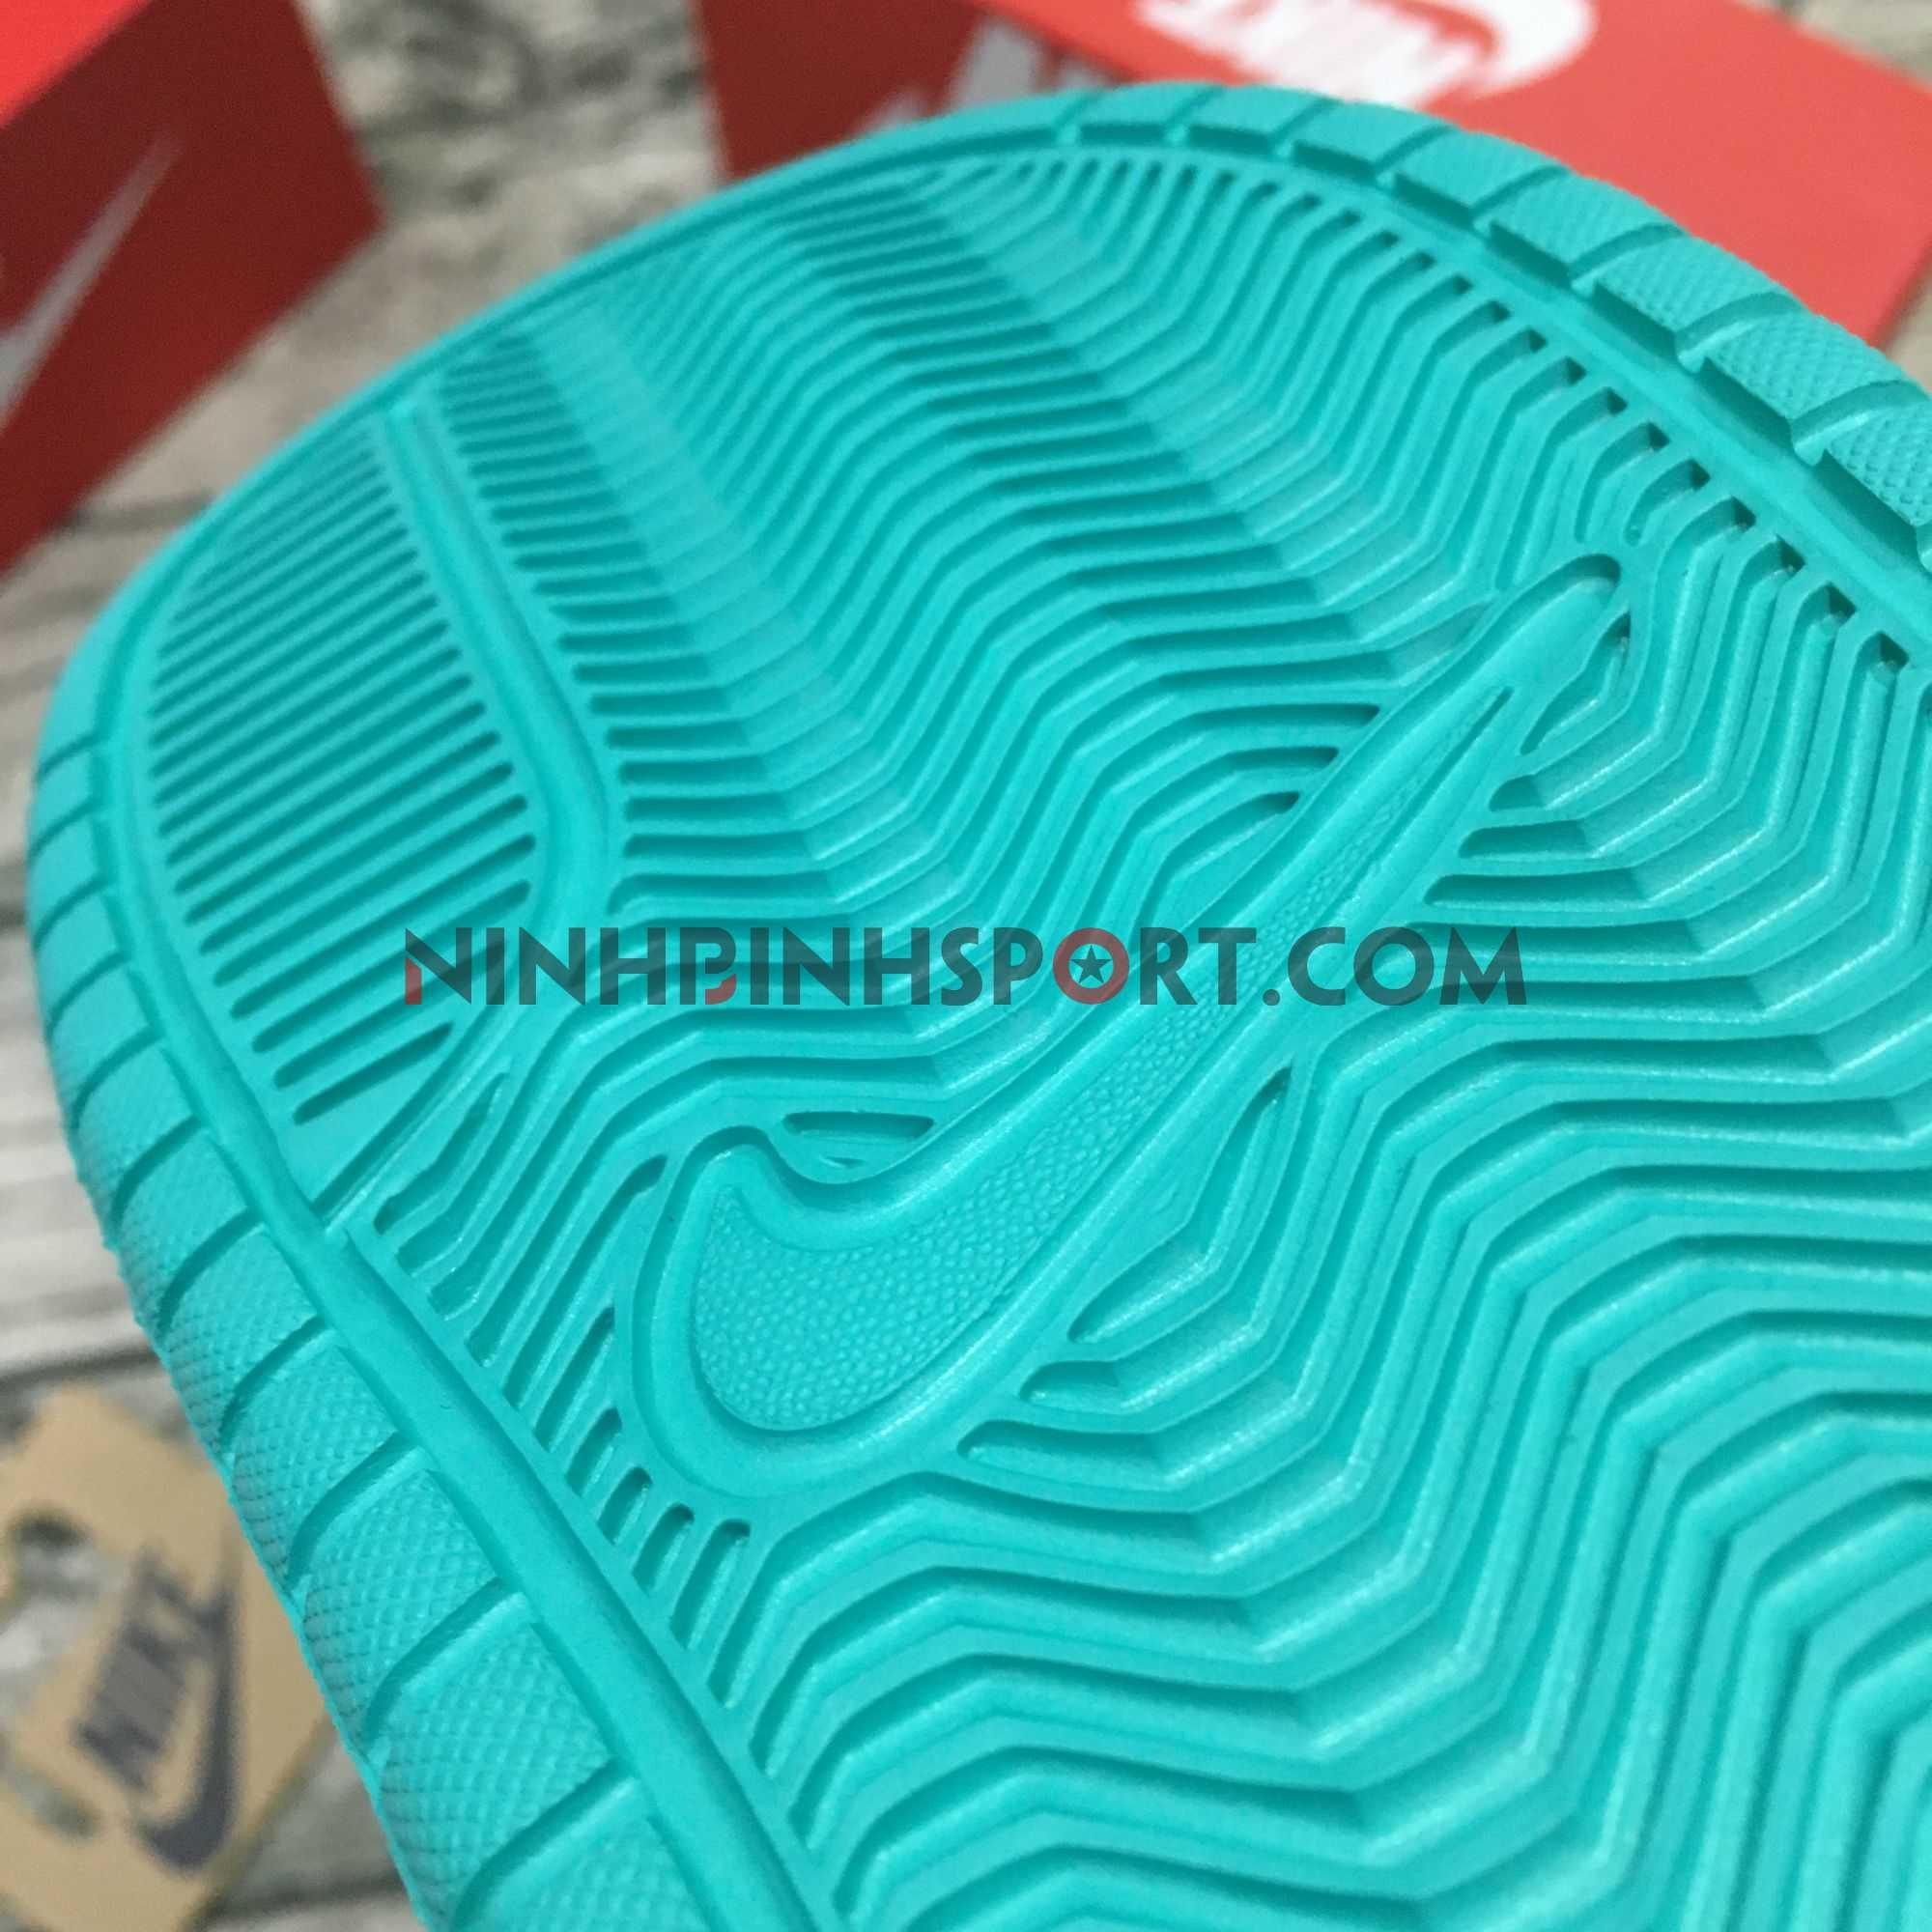 Dép thể thao nam Nike Benassi JDI 343880-303